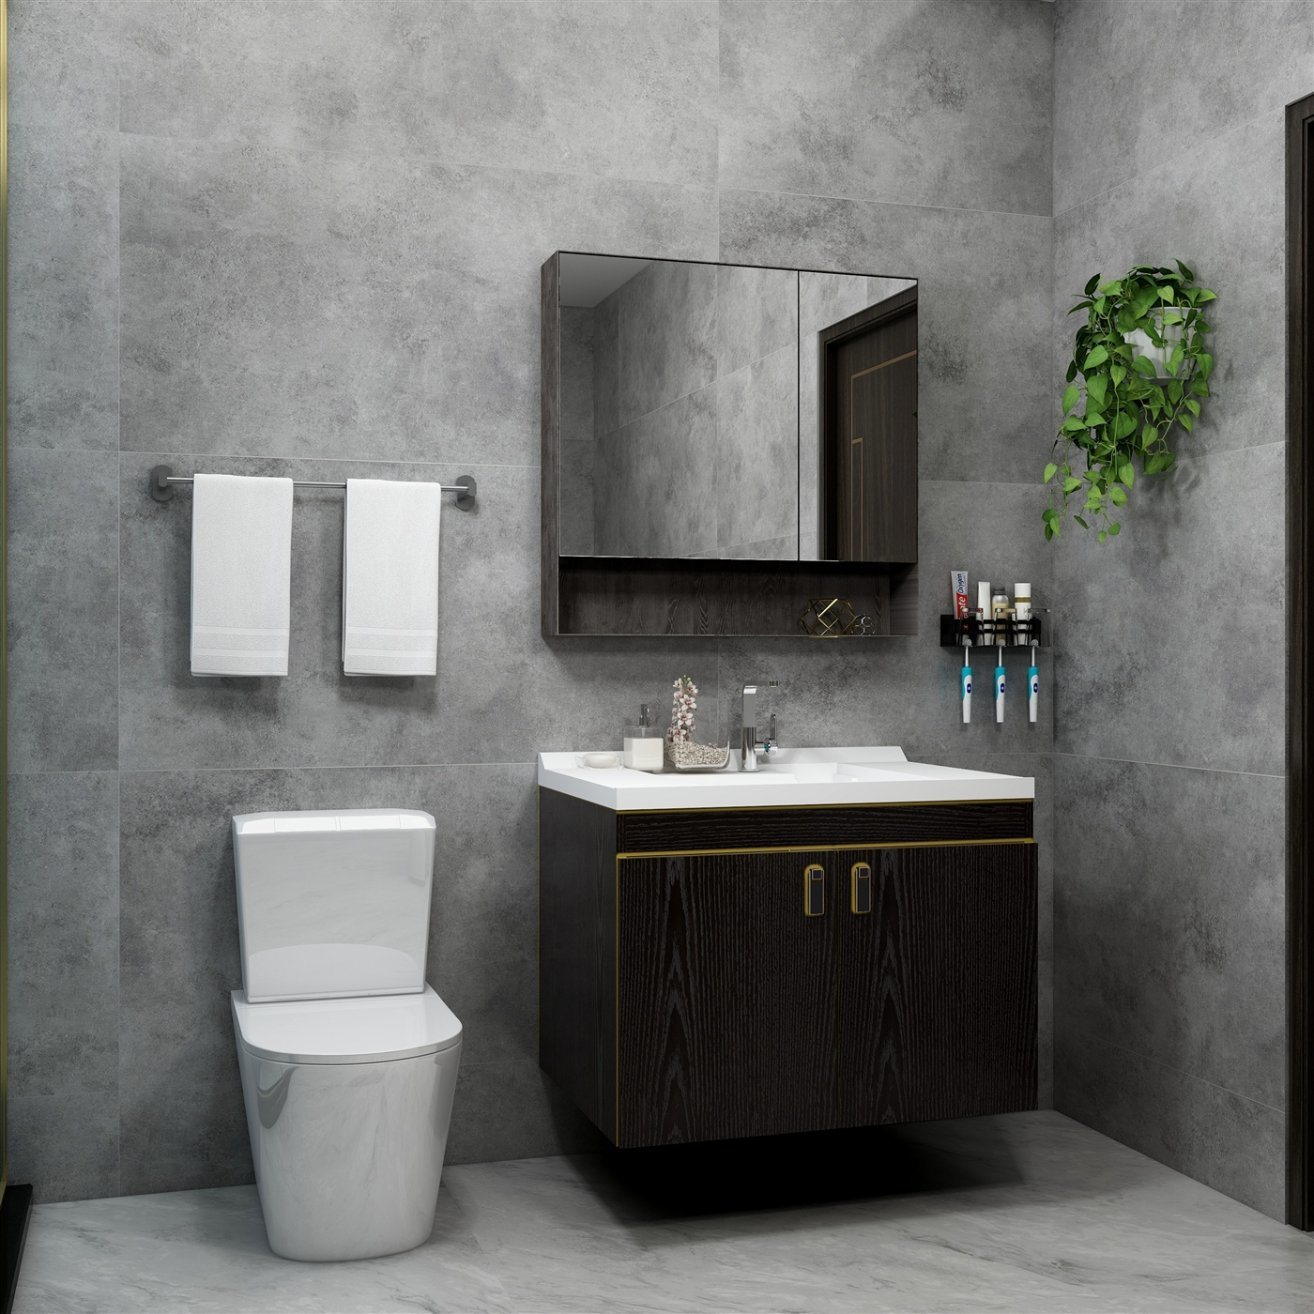 China 5 Star Hotel Toilet Basin Set China Toilet Basin Set Bathroom Basin Set